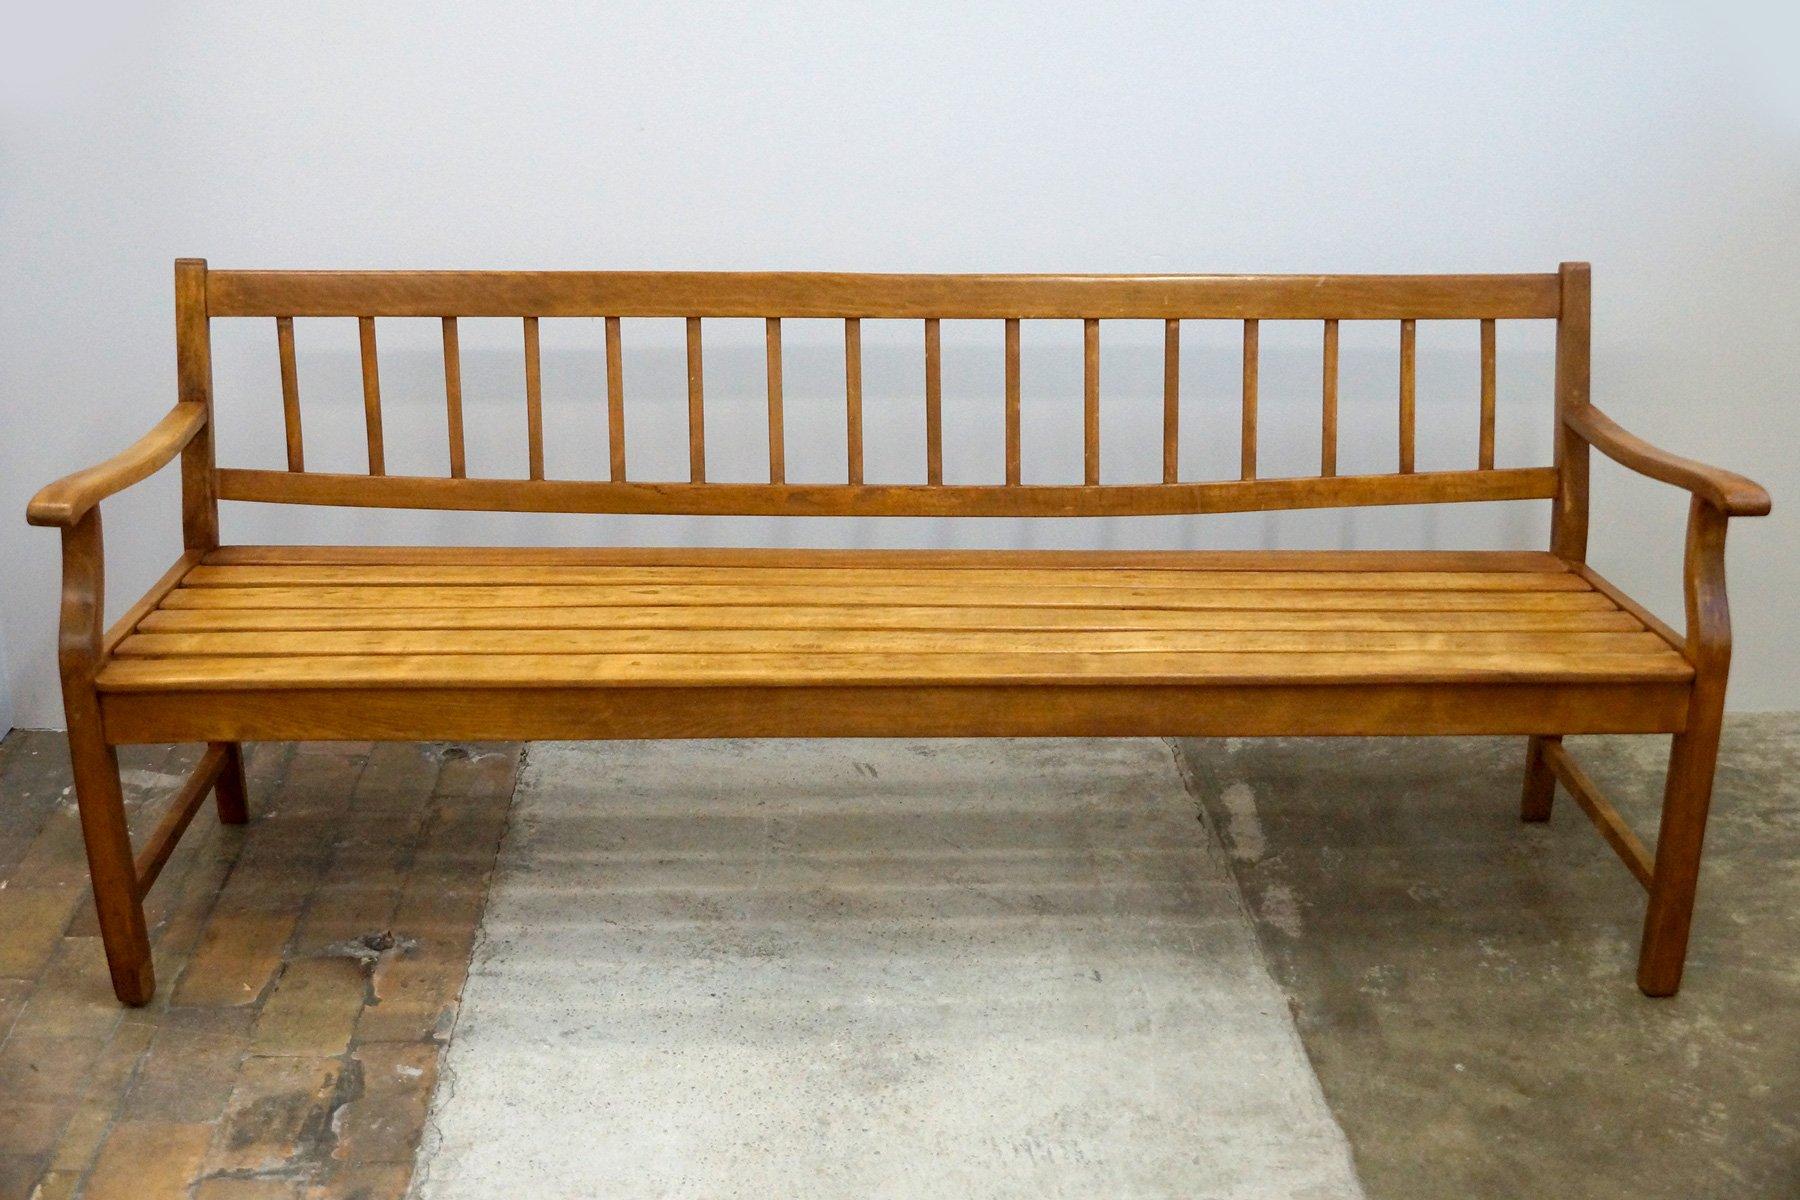 Biedermeier Sitzbank aus Holz, 1840er